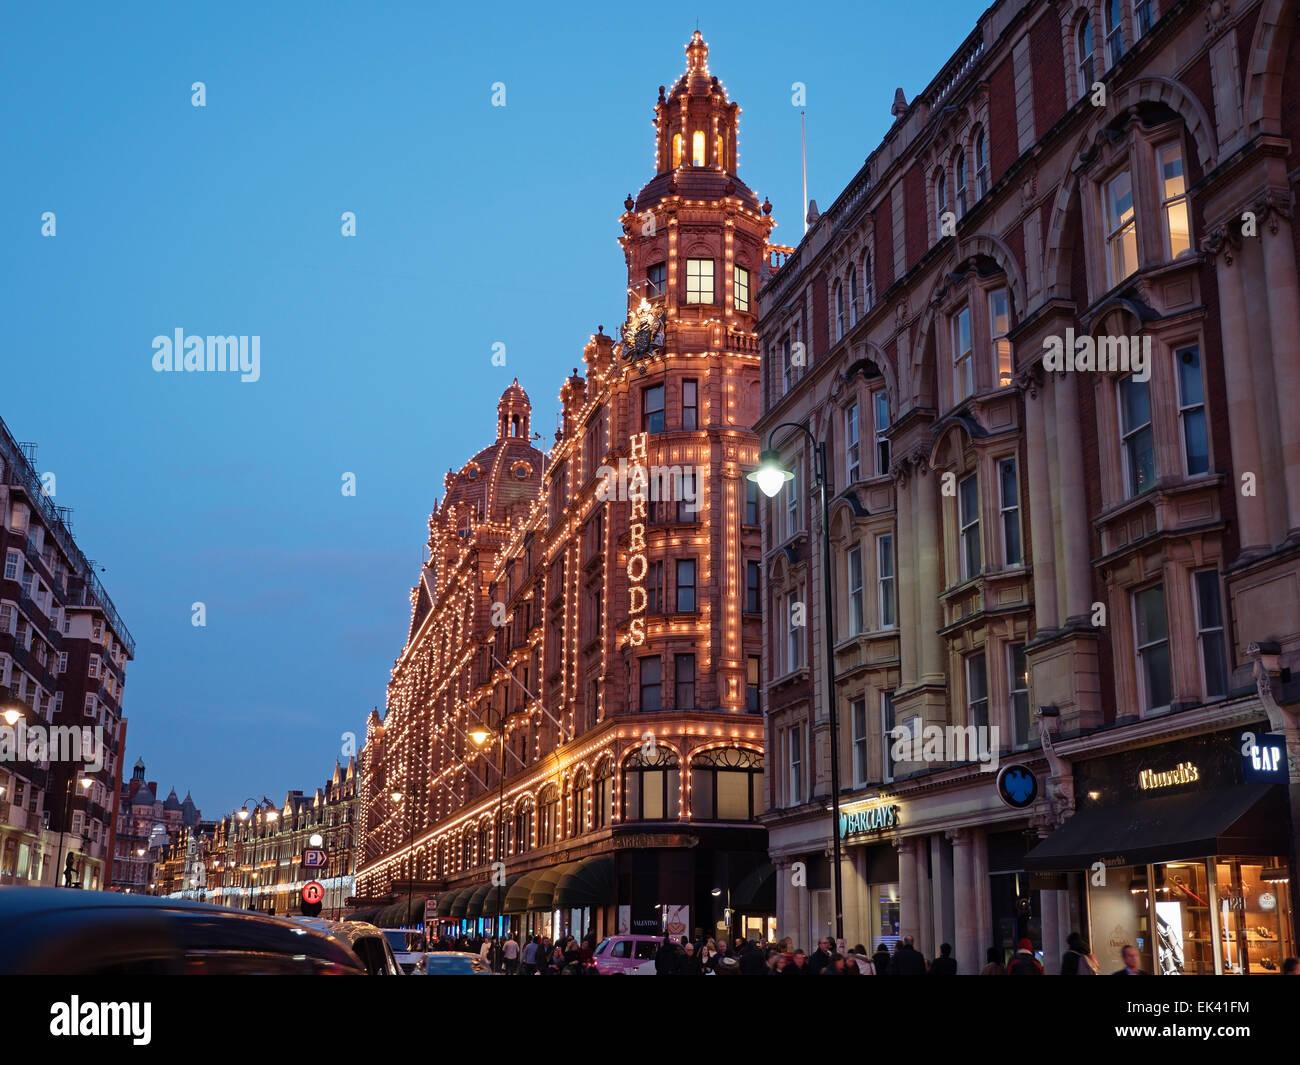 Harrods Department Store at Night, Brompton Road, Knightsbridge, Royal Borough of Kensington and Chelsea, London, Stock Photo